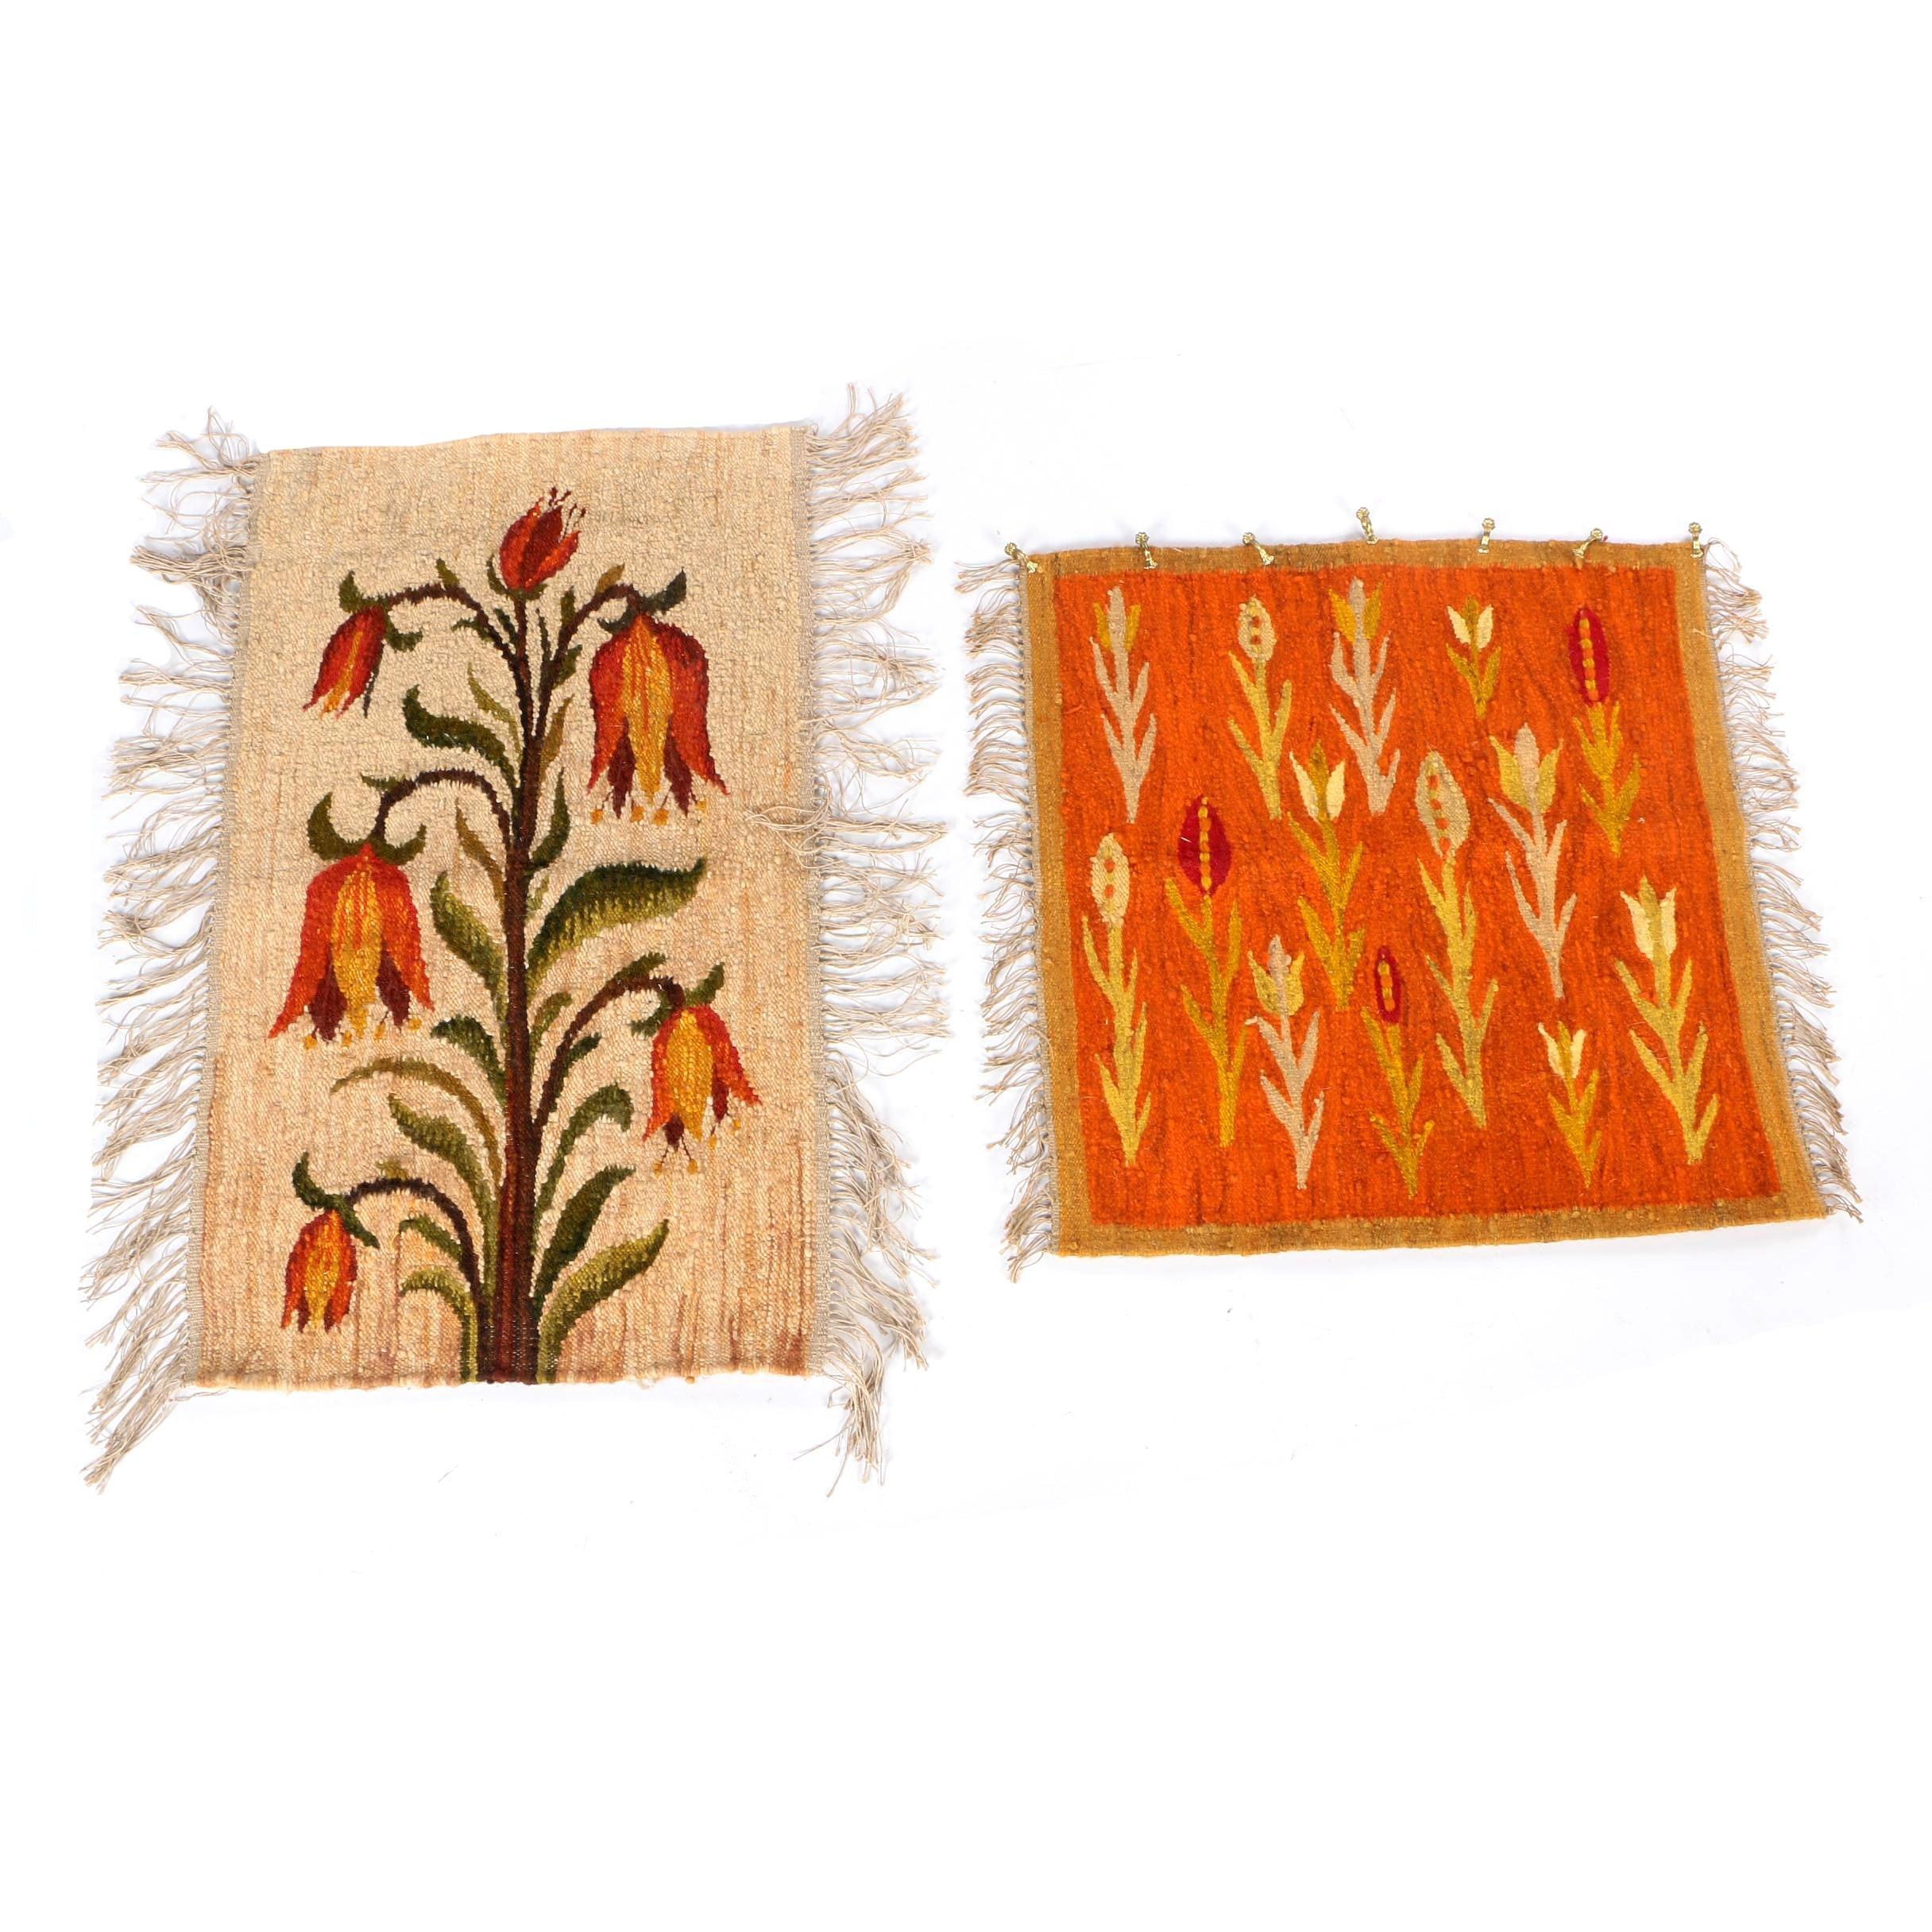 Handwoven Polish Wool Textiles